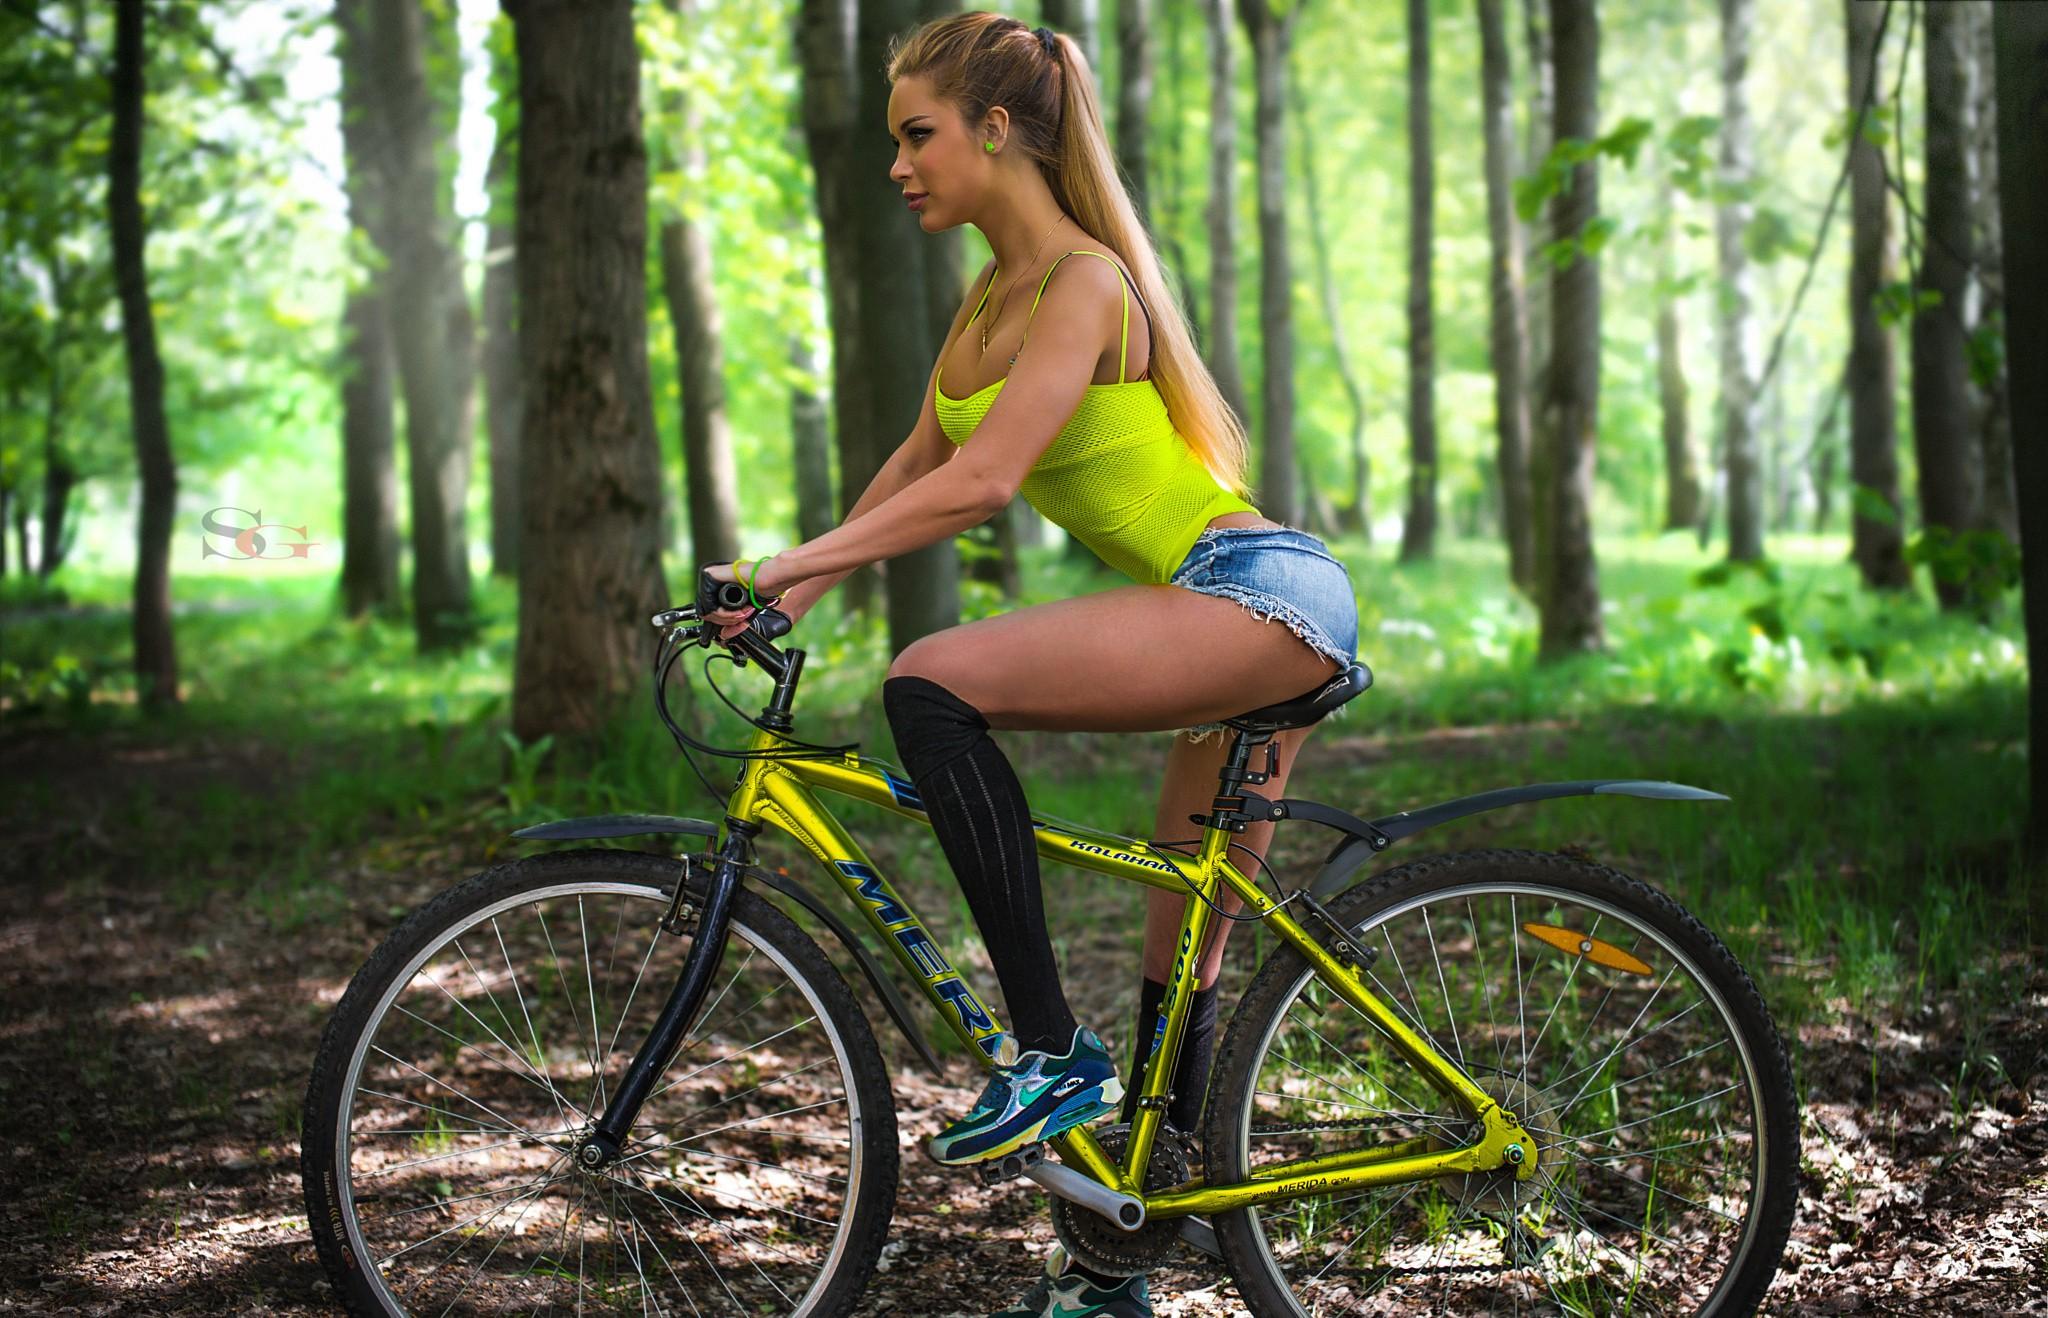 Humilation sissy gym pantyhose